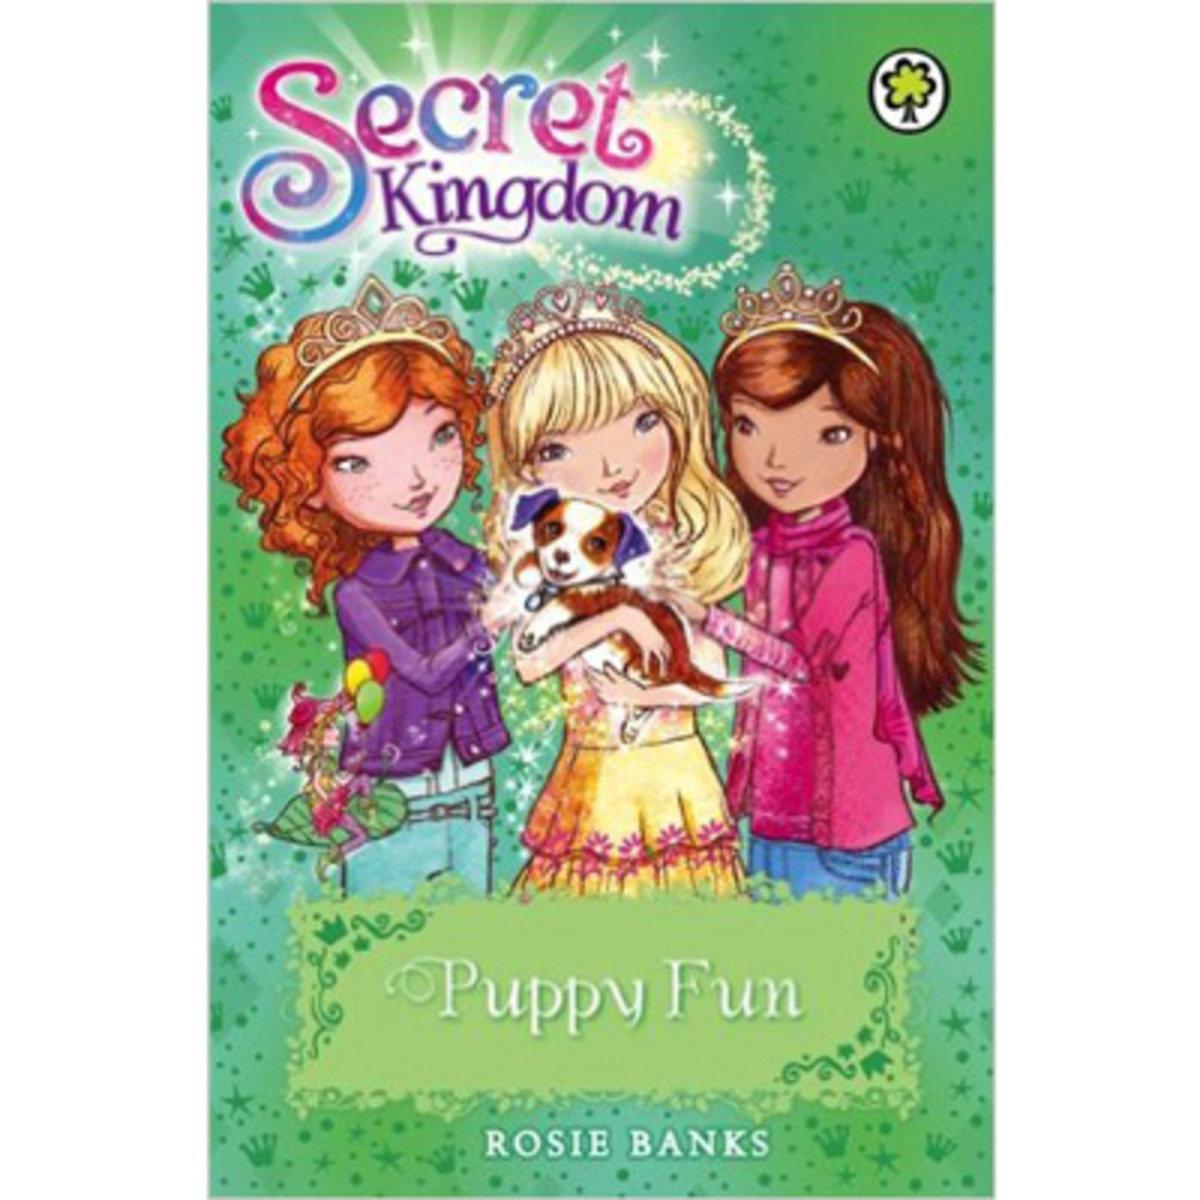 SECRET KINGDOM #19 PUPPY FUN 9781408329009